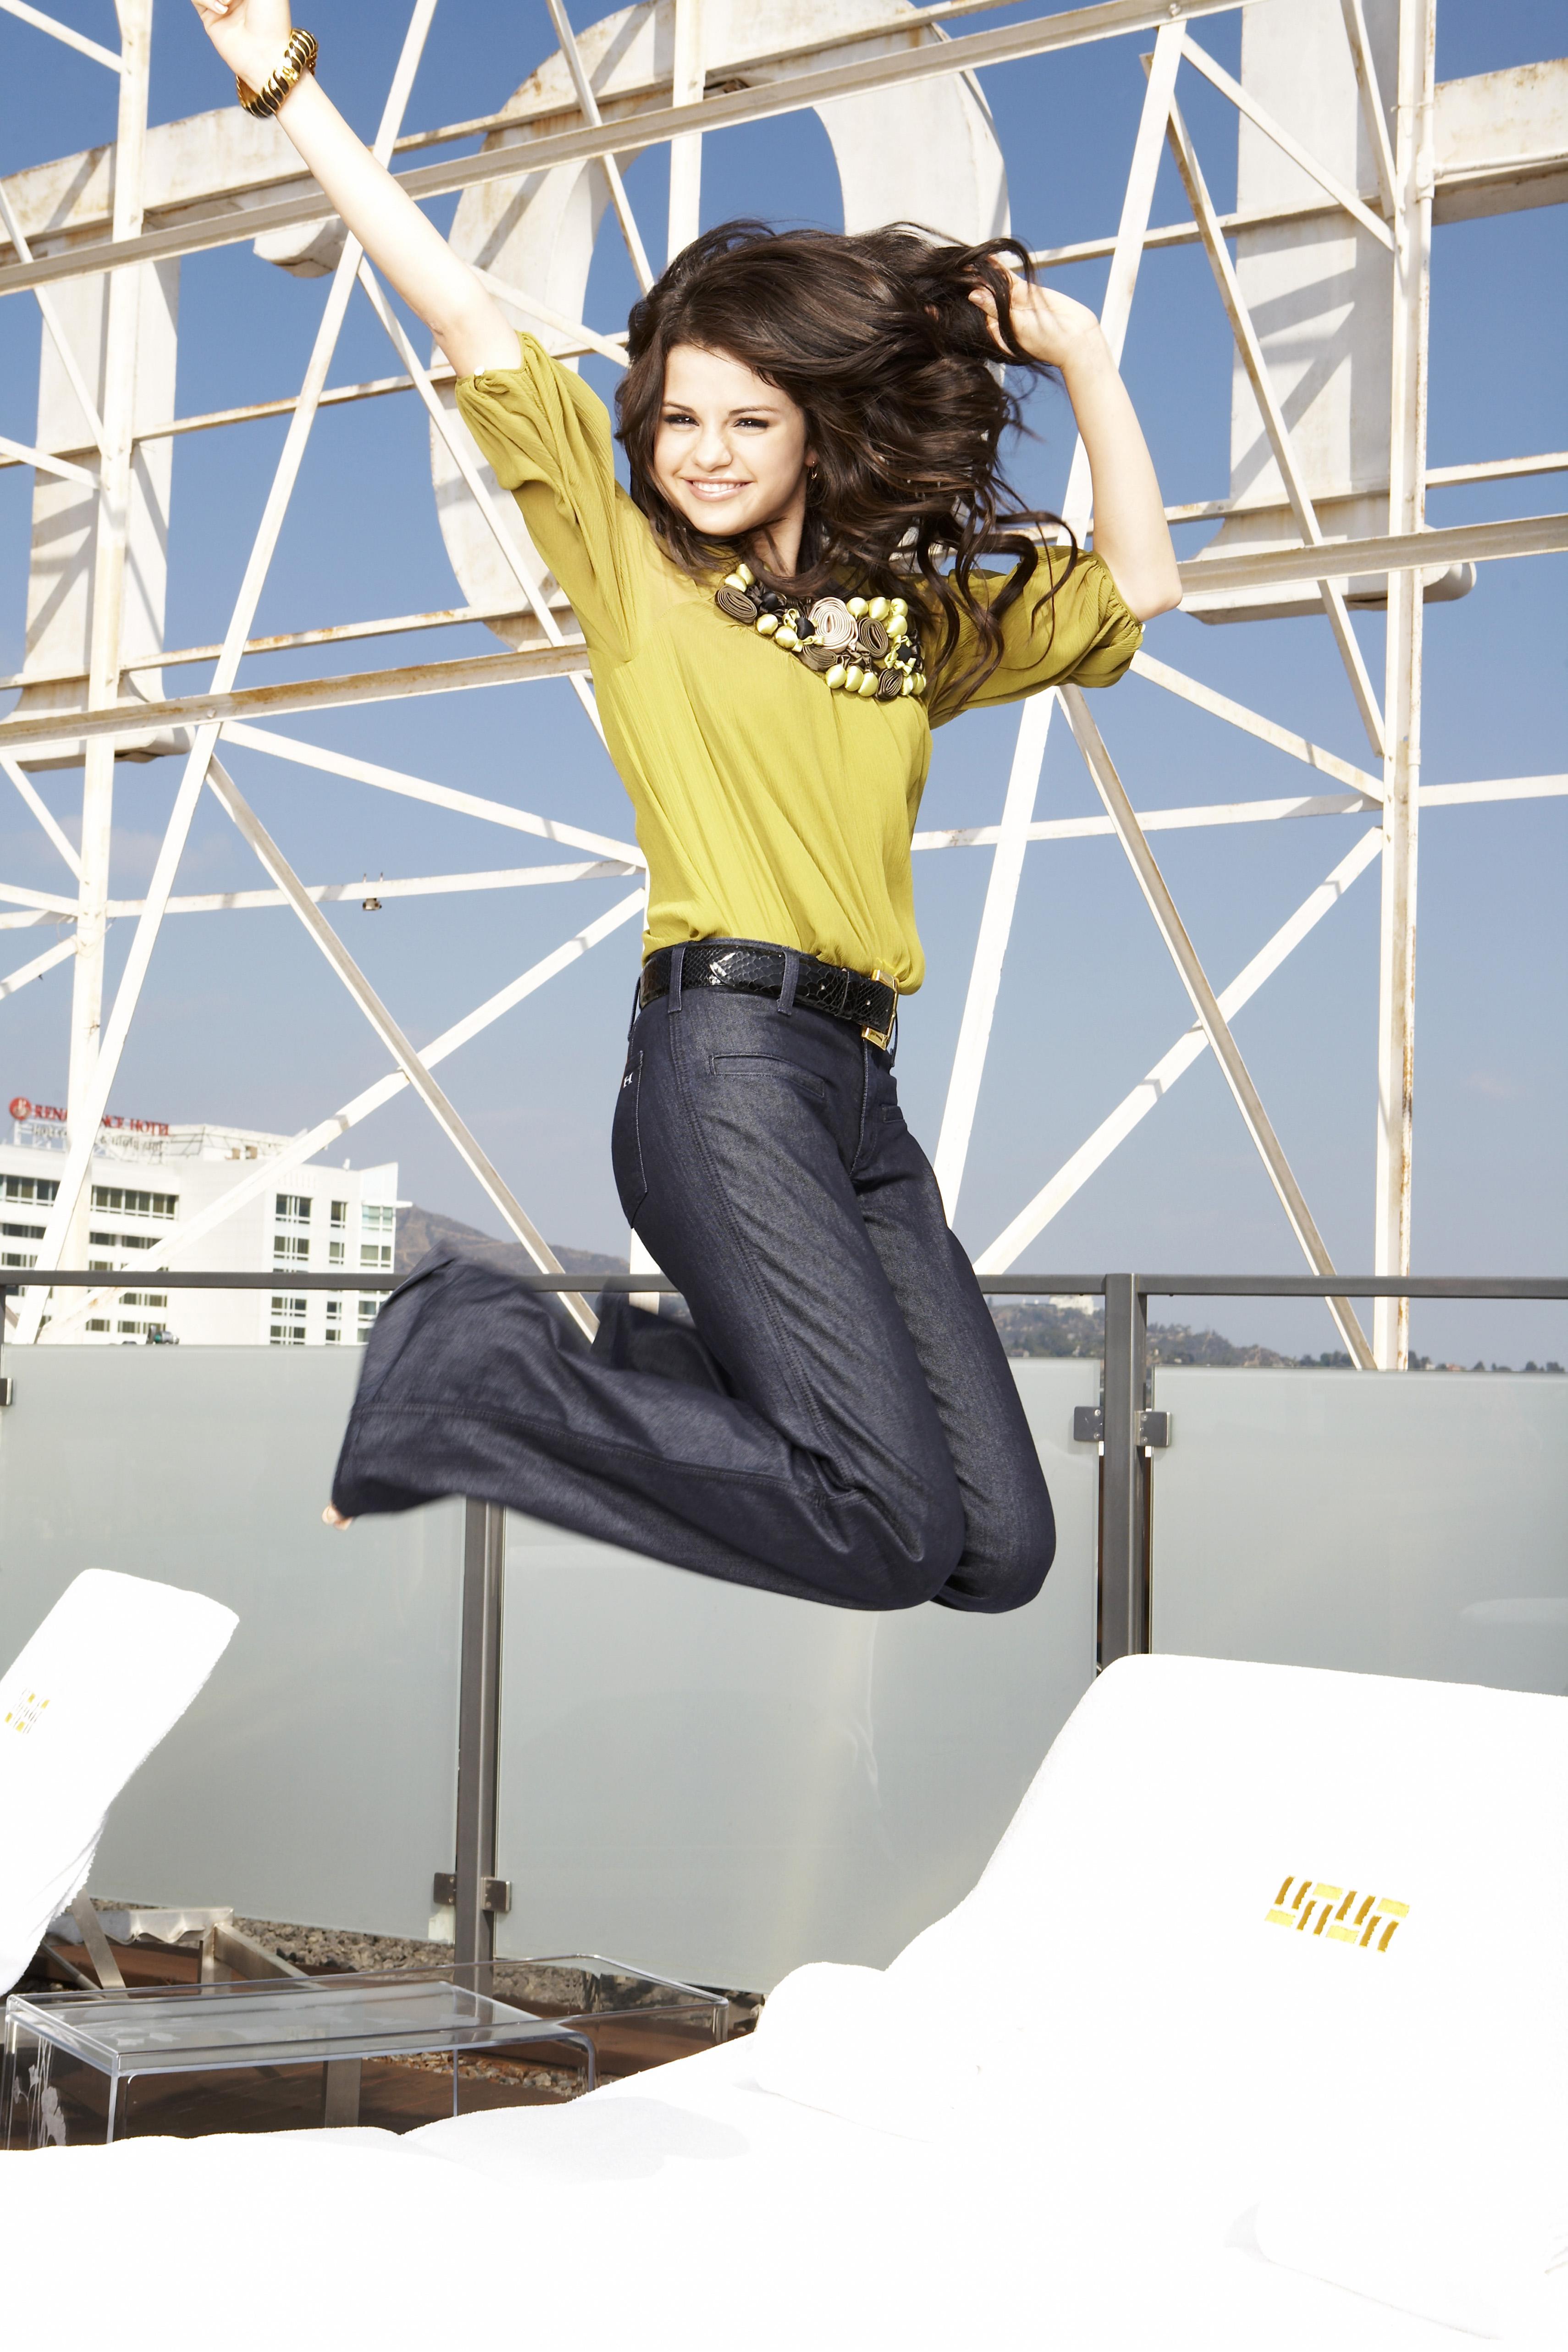 Селена Гомез - Фото для журнала OK Magazine 2008 года HQ